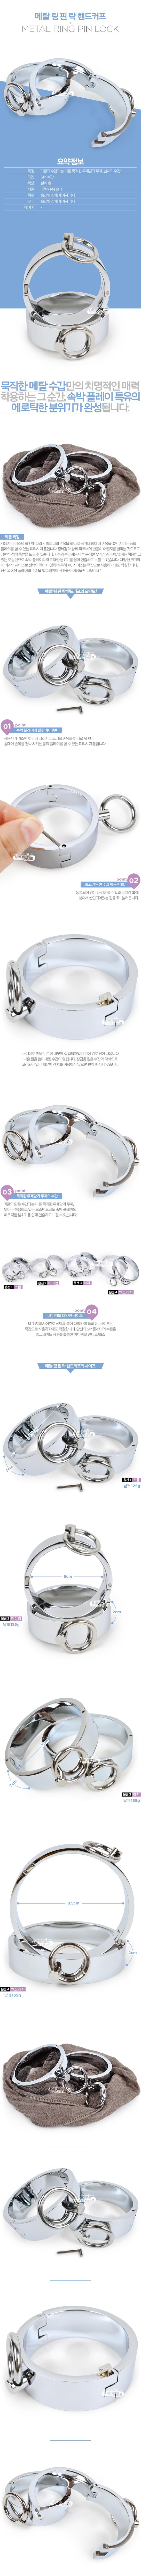 [SM 수갑] 메탈 링 핀 락 핸드커프(Metal Ring Pin Lock Handcuff) - HSY(CF001)